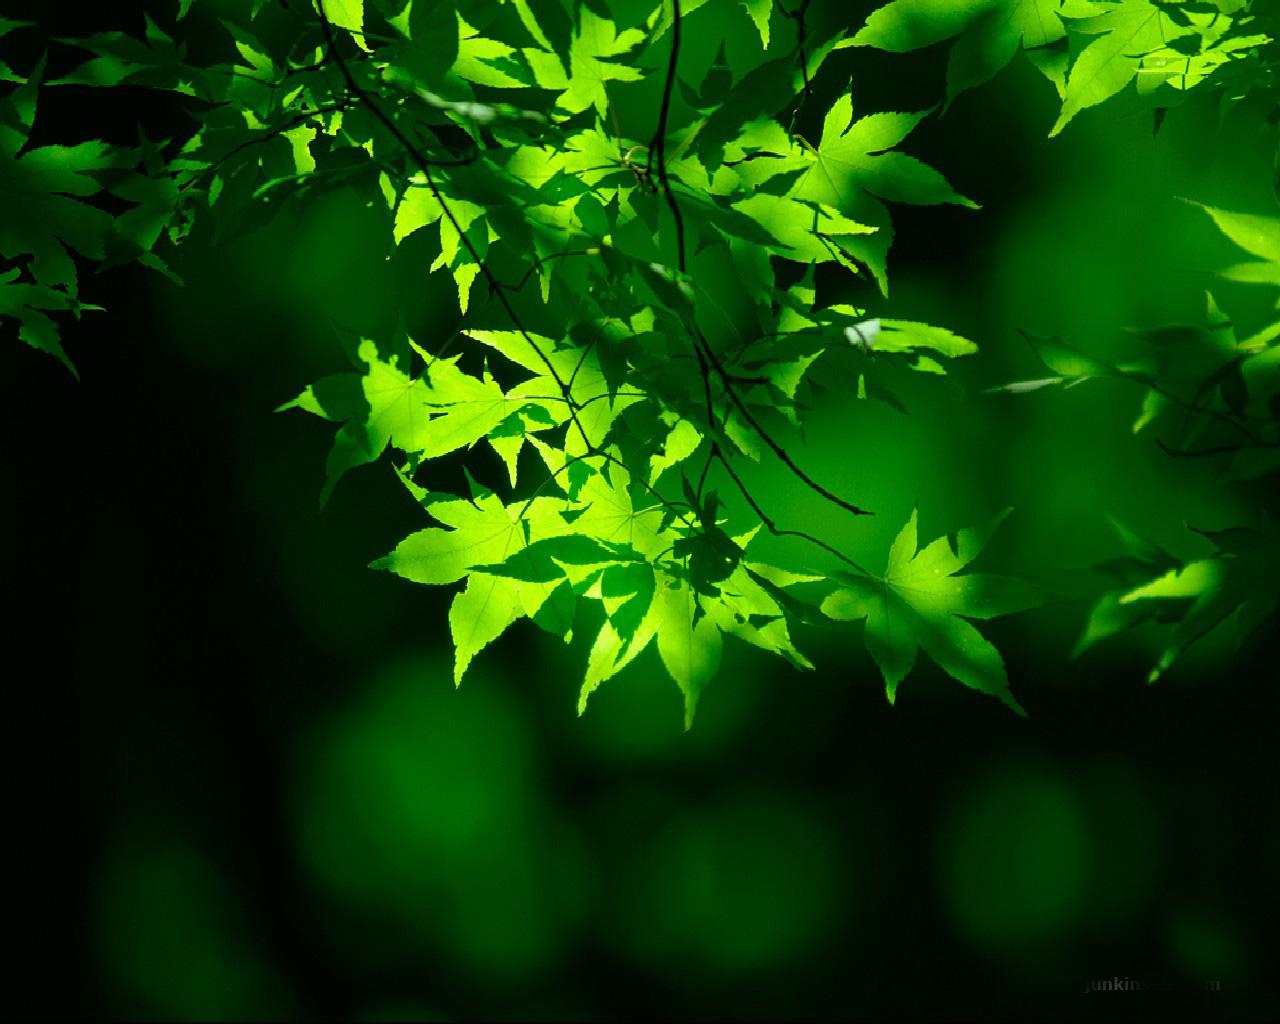 Natural Green Wallpaper Top HD Wallpapers 1280x1024